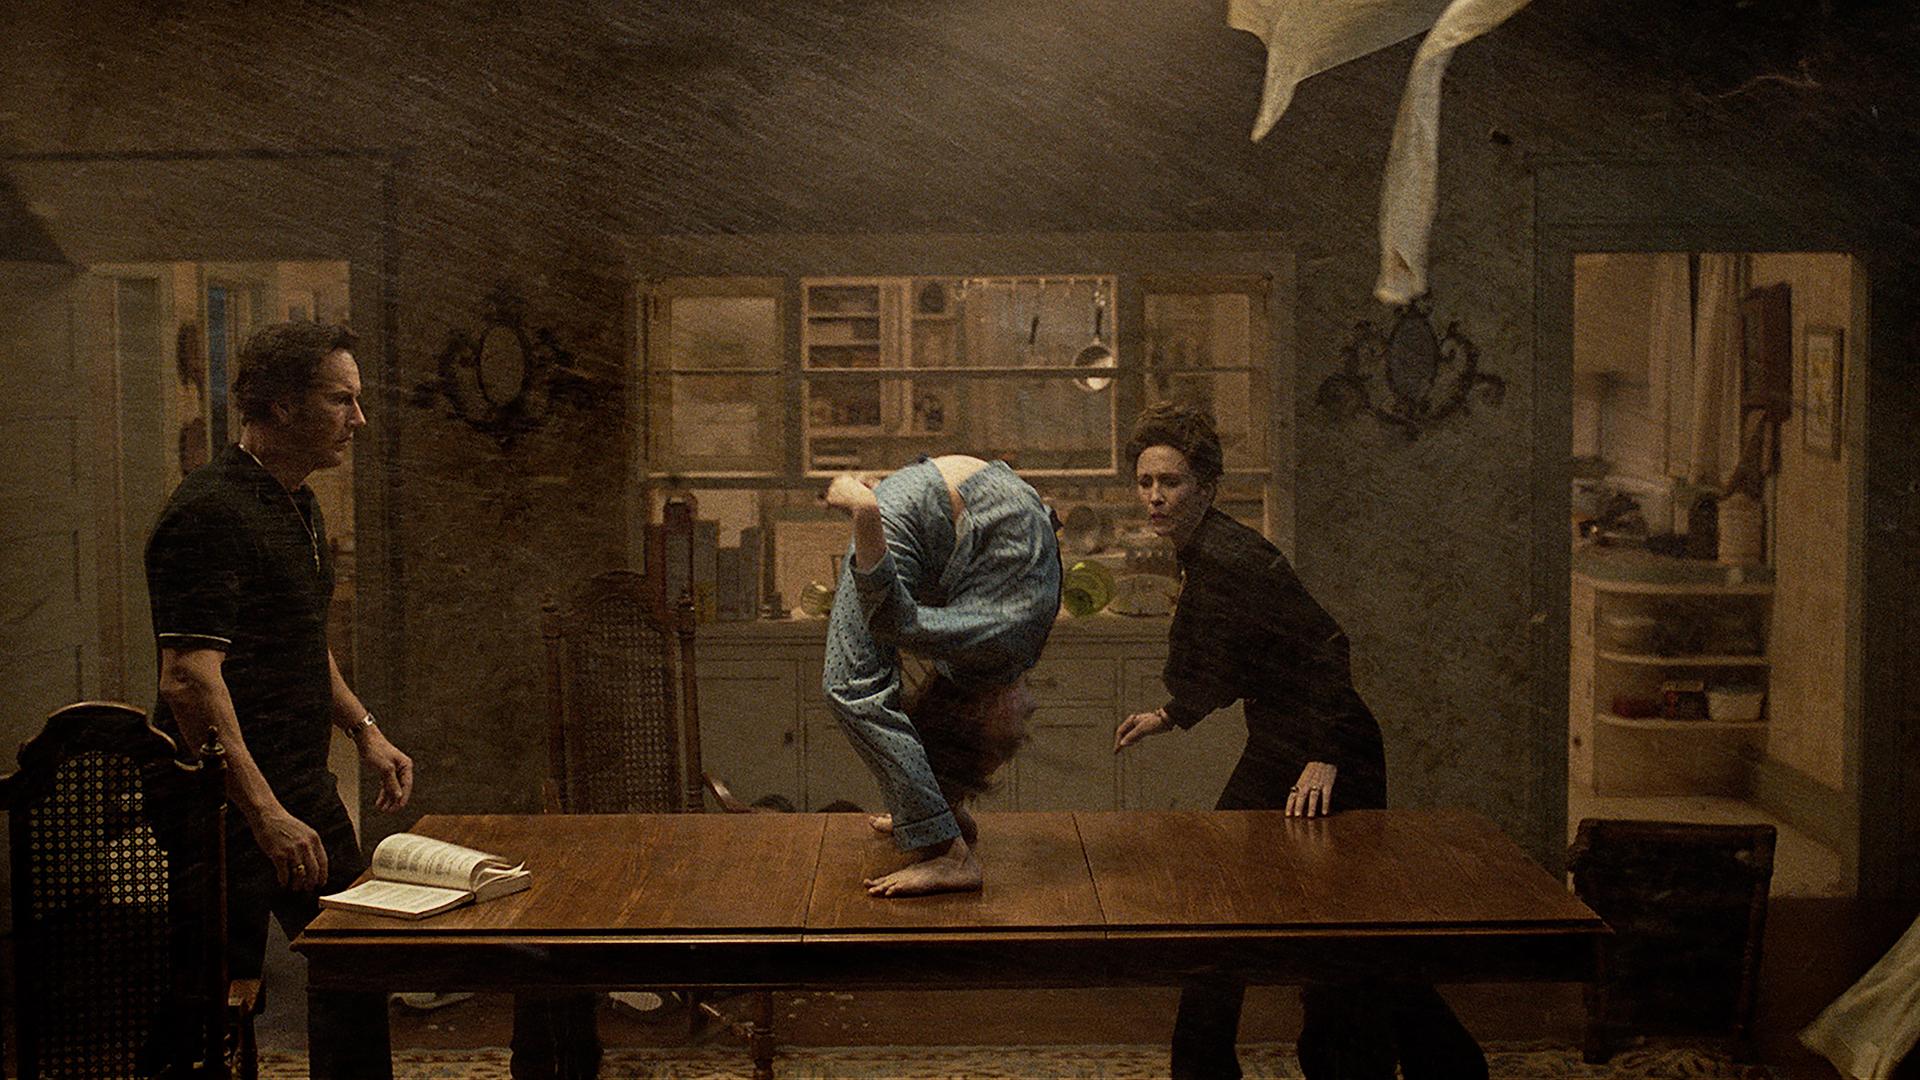 El conjuro, the conjuring, Warren, Terror, horror, WB, annabelle